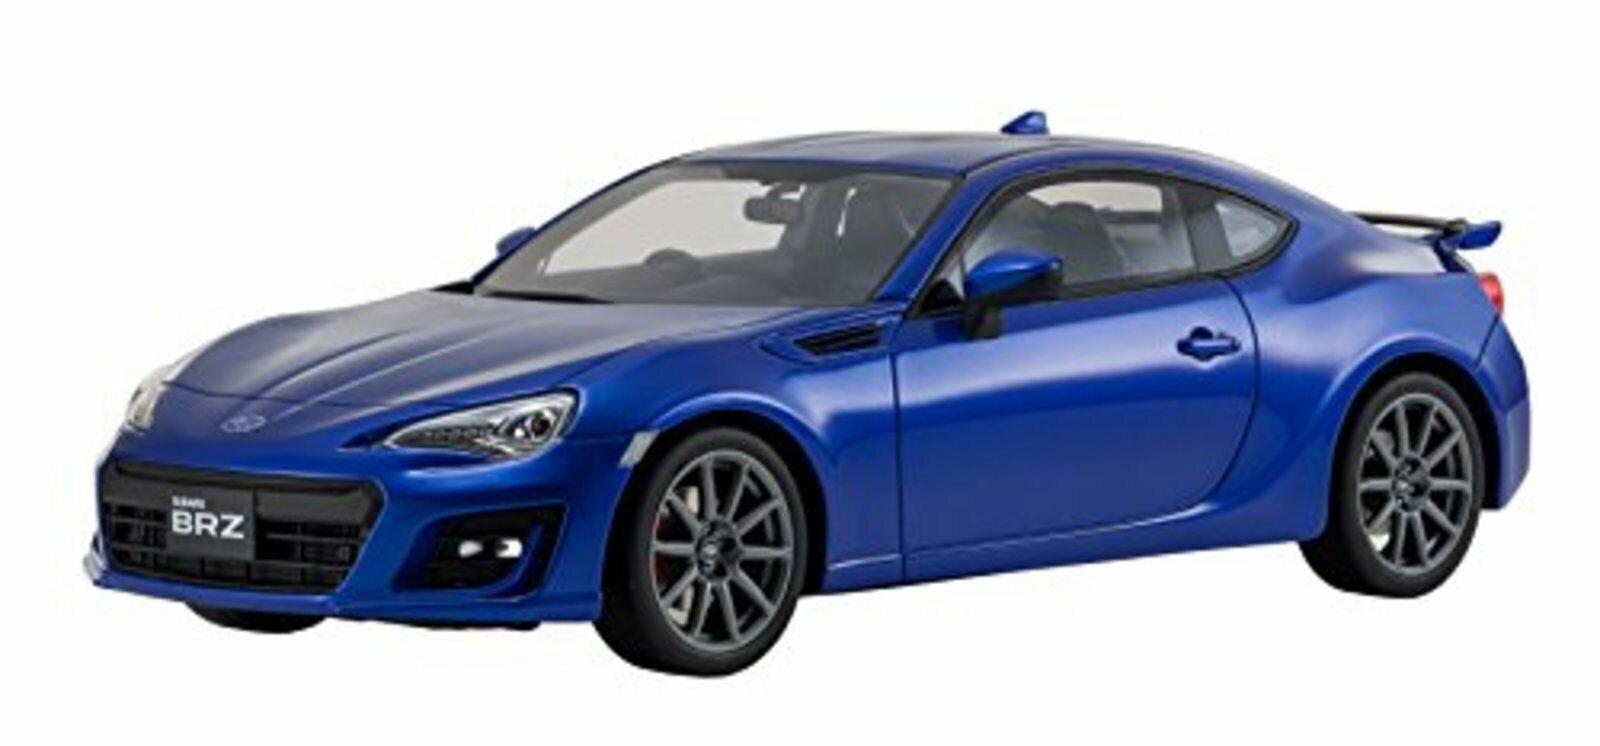 Kyosho  Original Samurai 1 18 Subaru Brz bleu Resina Modelo KSR18027BL F S con    remise